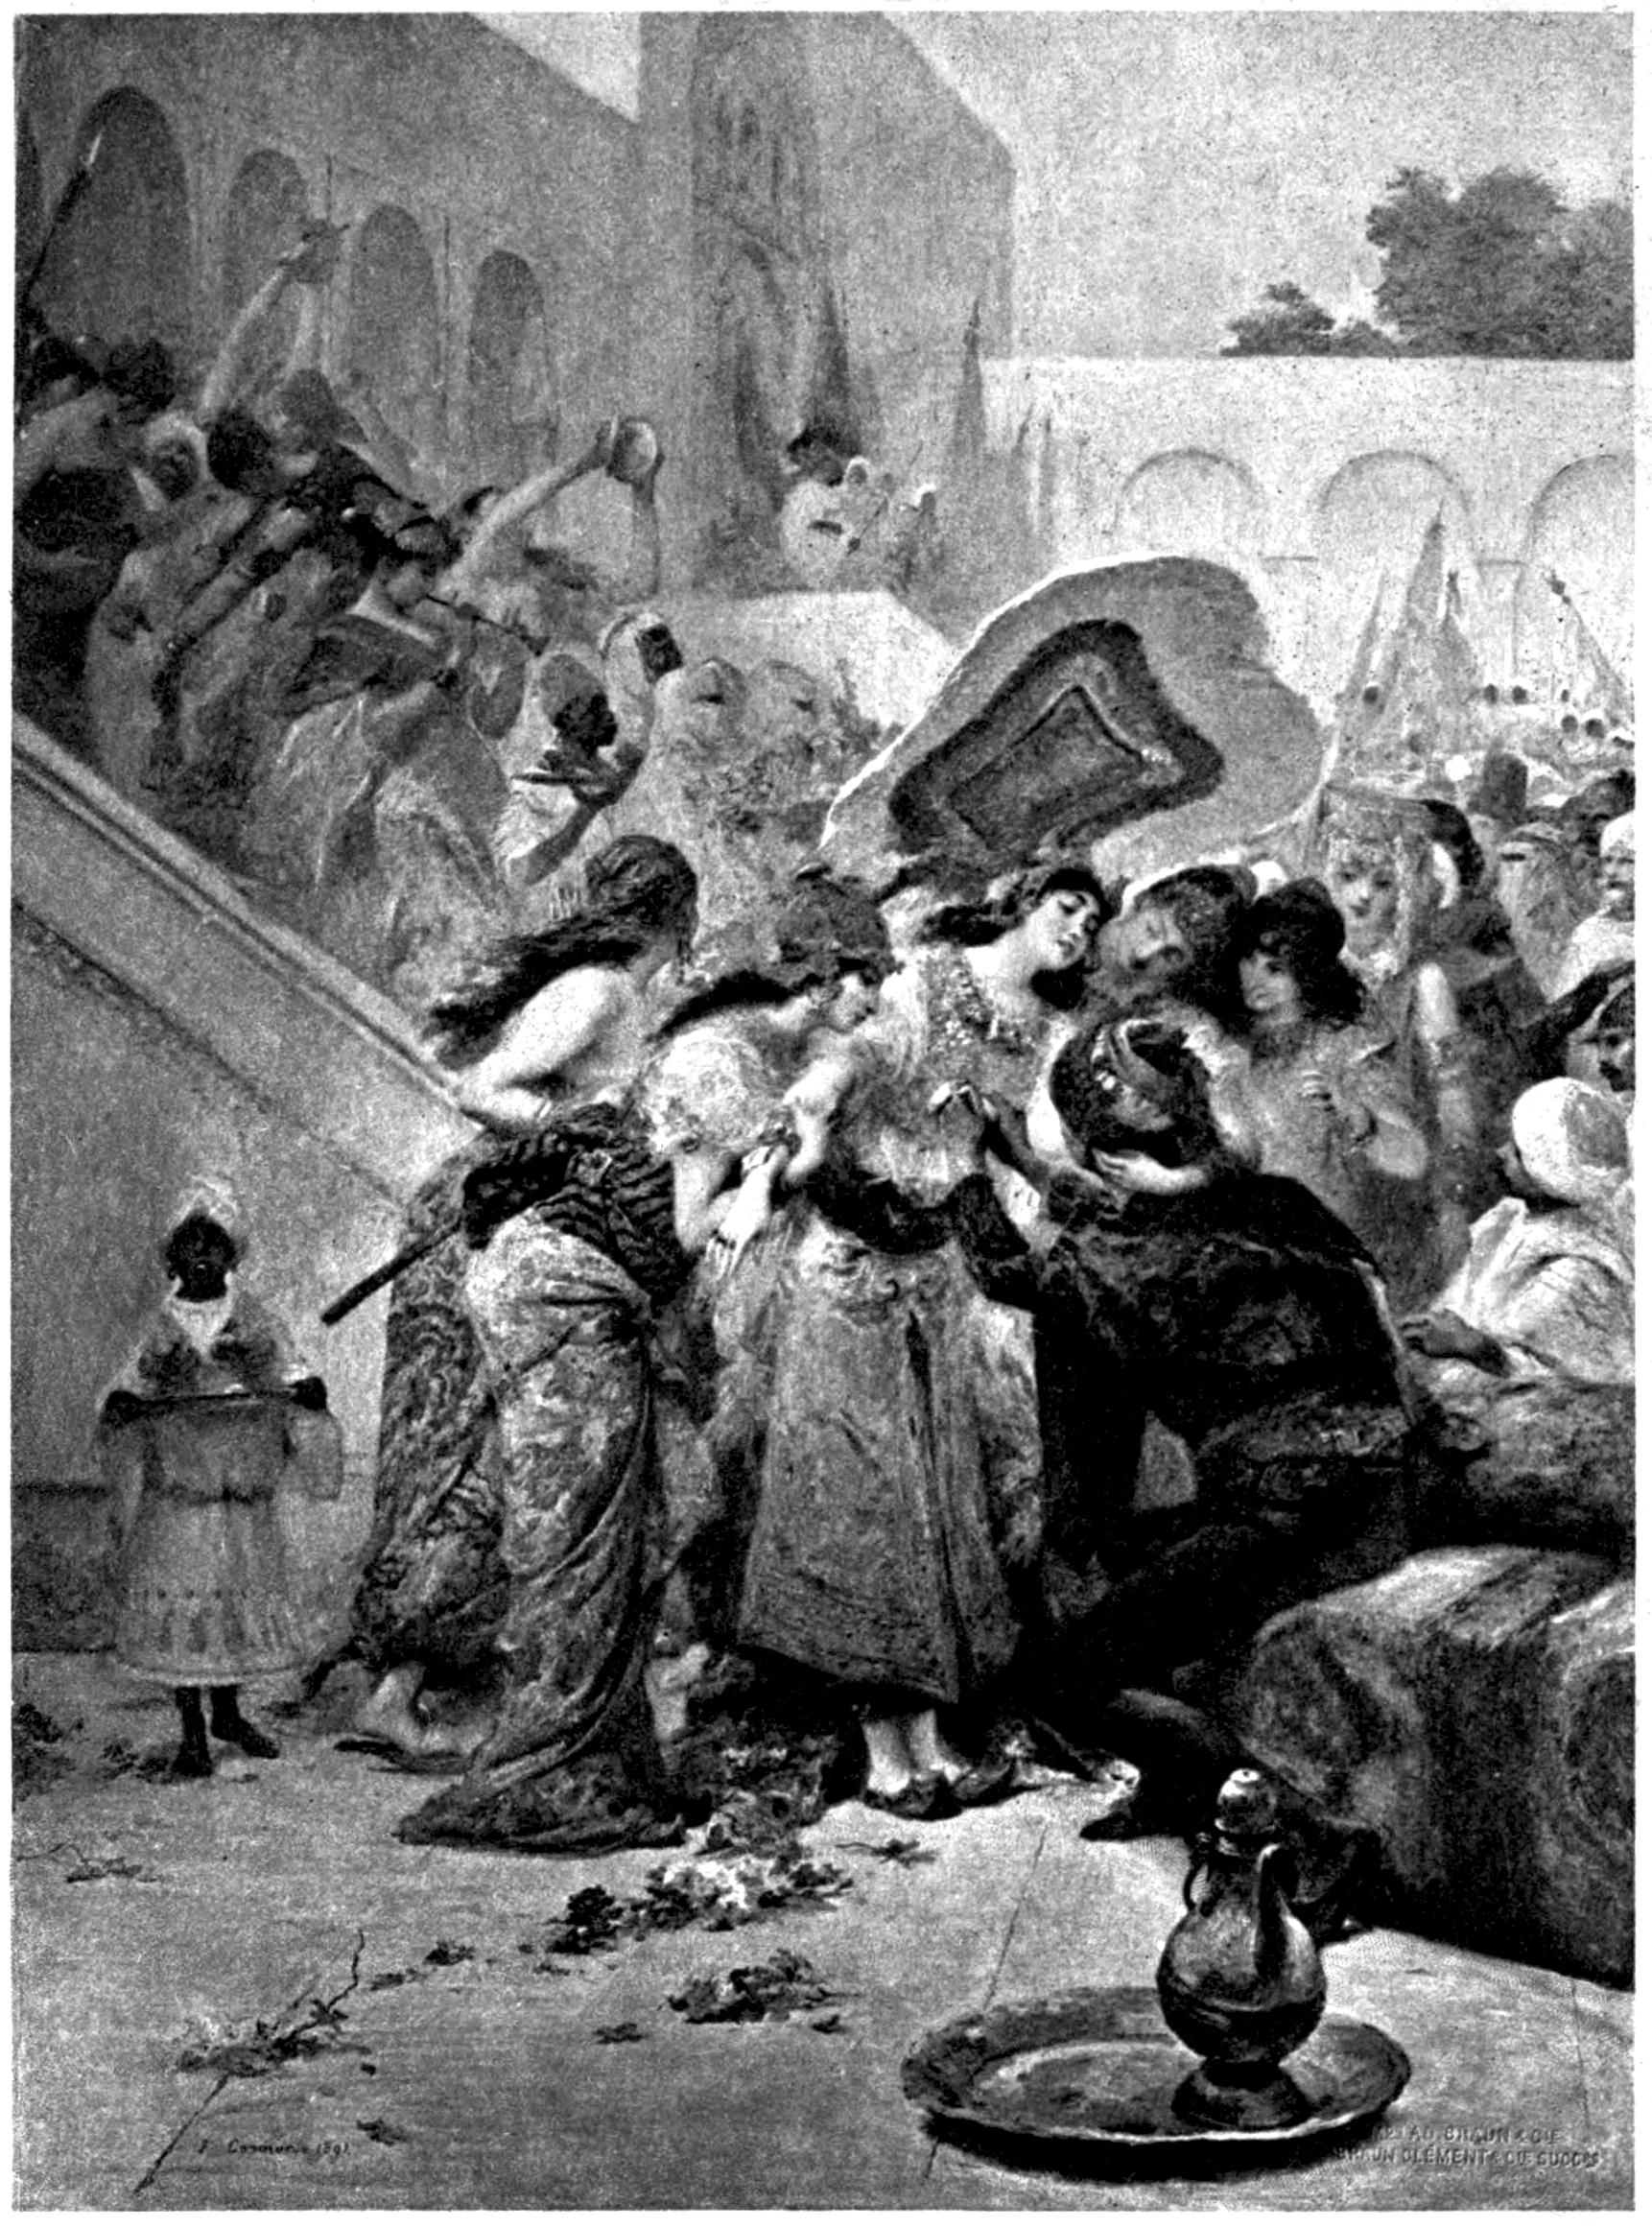 Frontispiece of Burton's Arabian Nights, volume 1